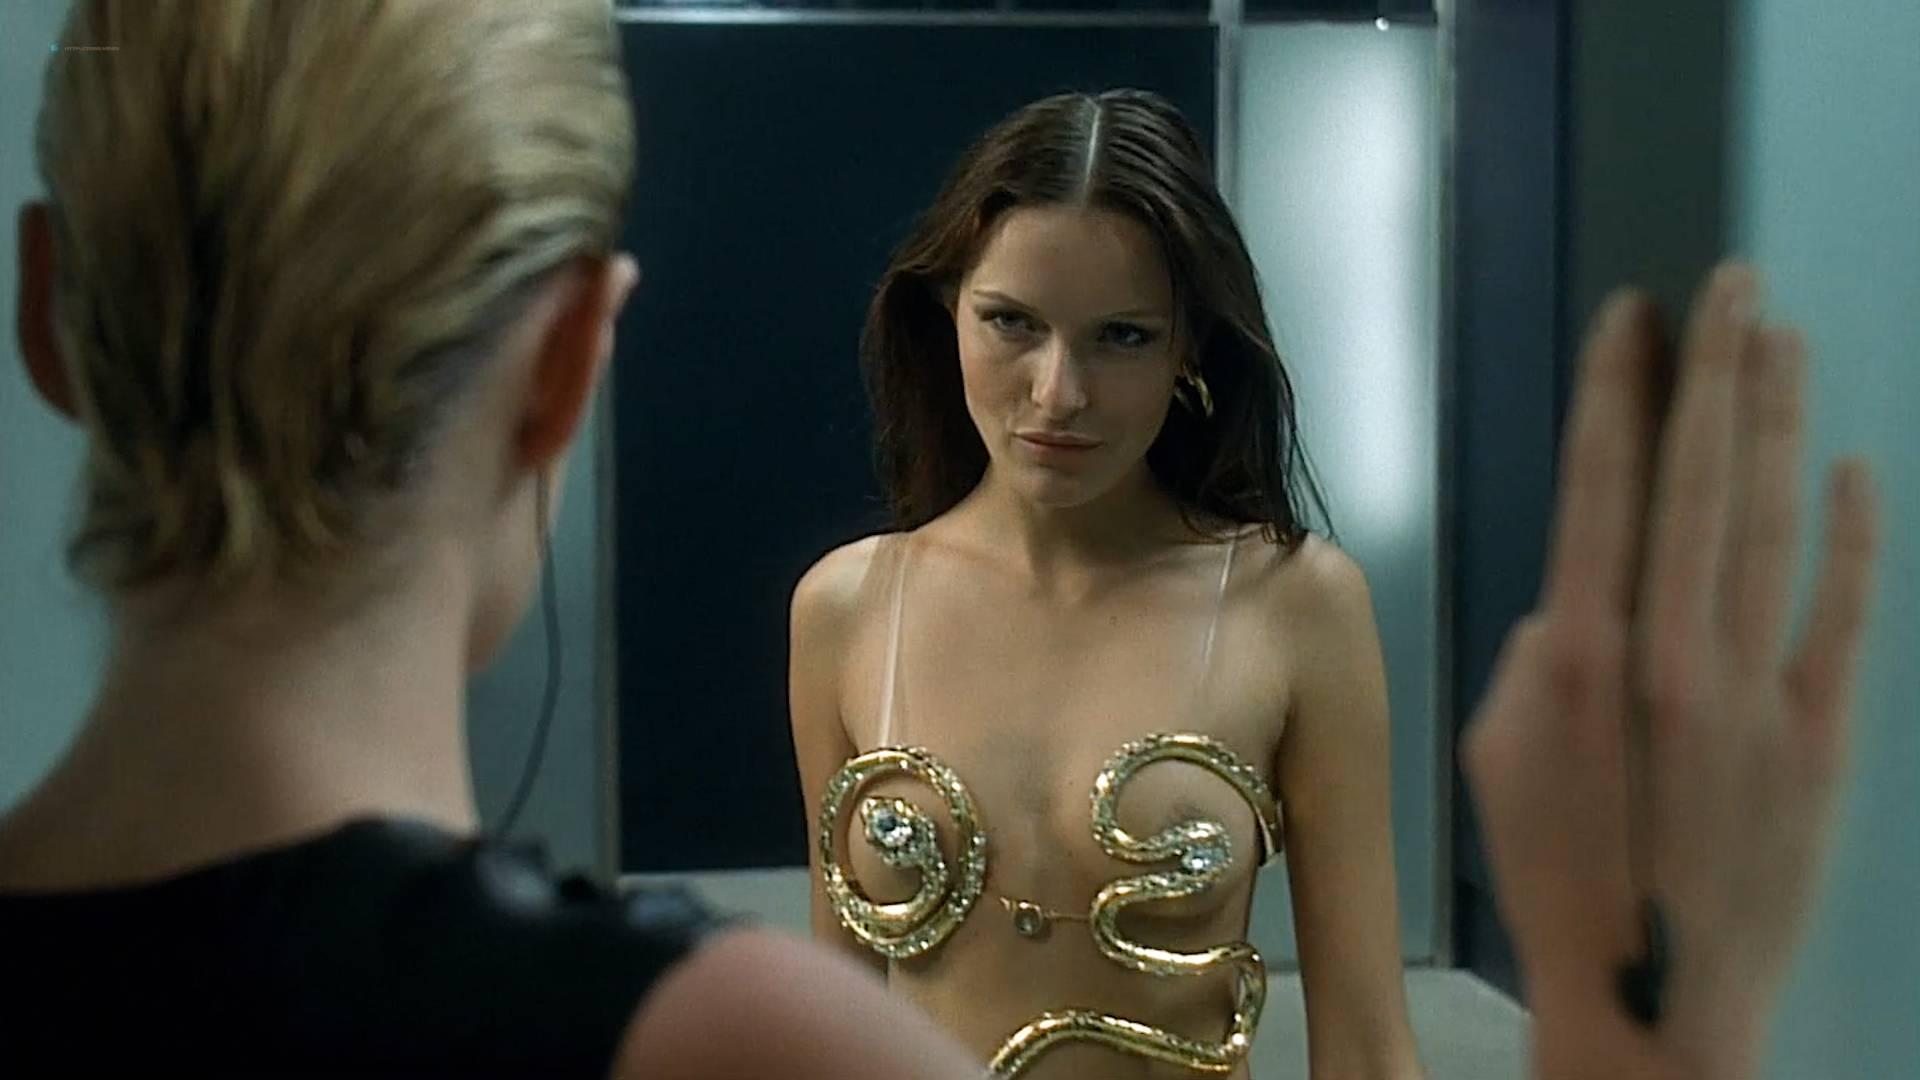 Rebecca romijn desnuda